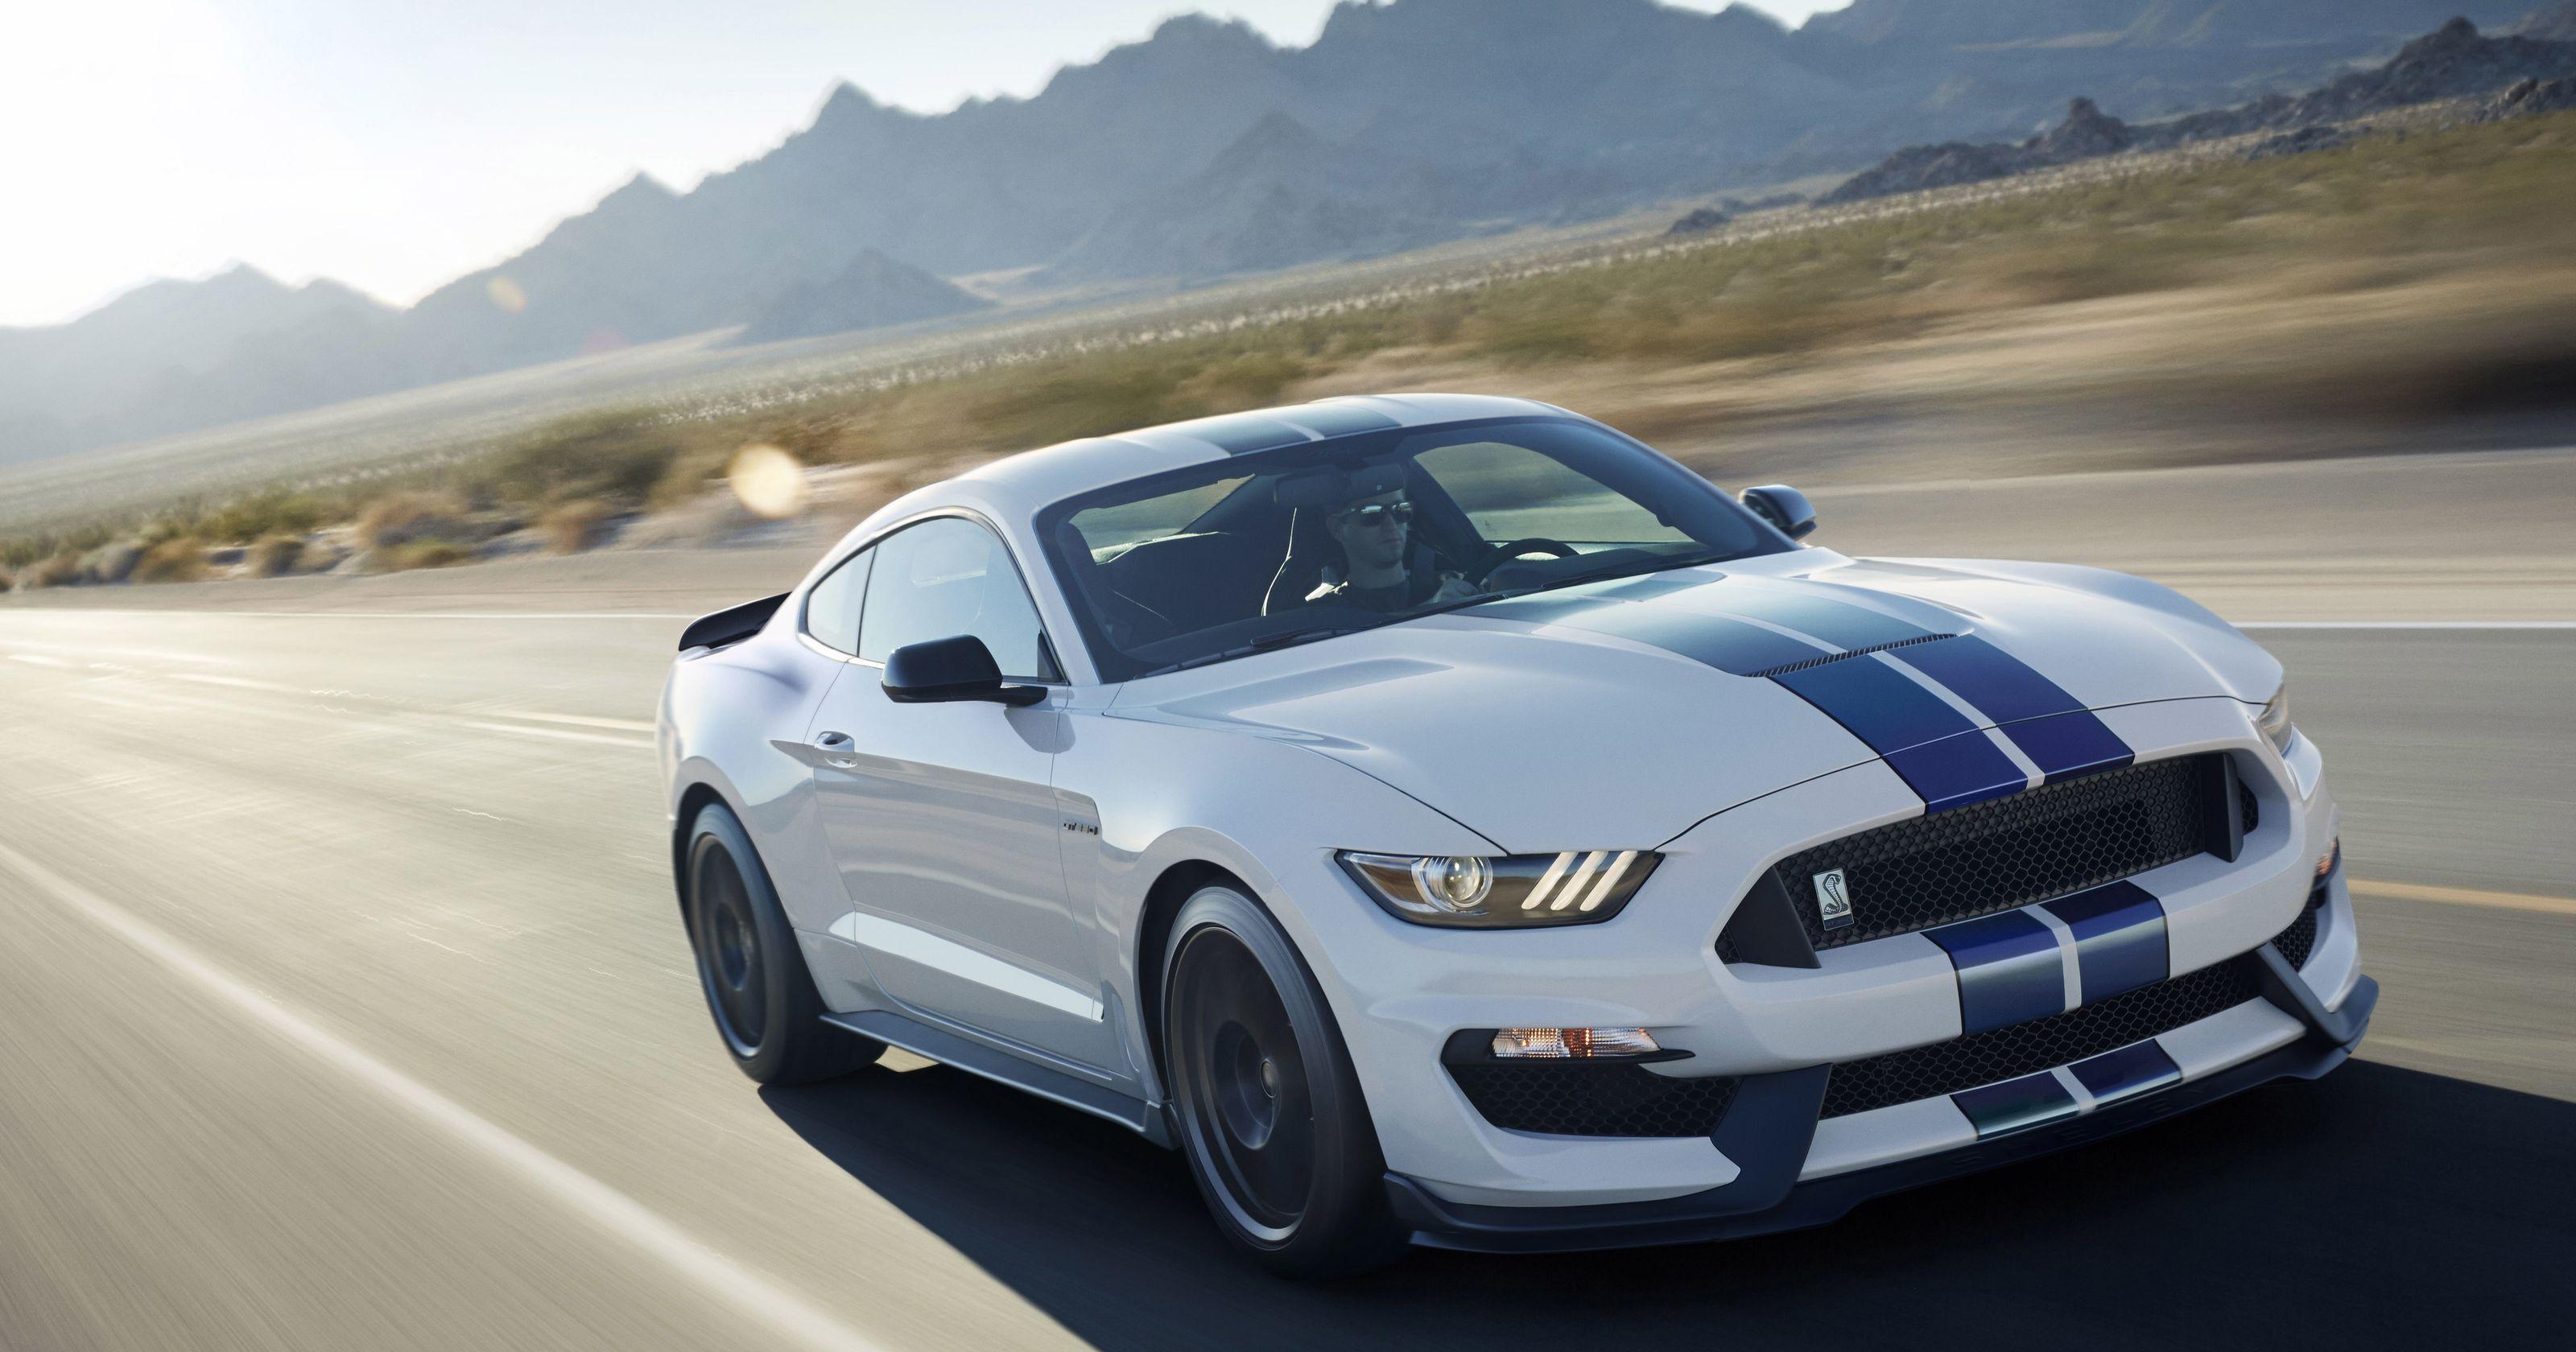 41+ Mustang gt350r wallpaper High Resolution